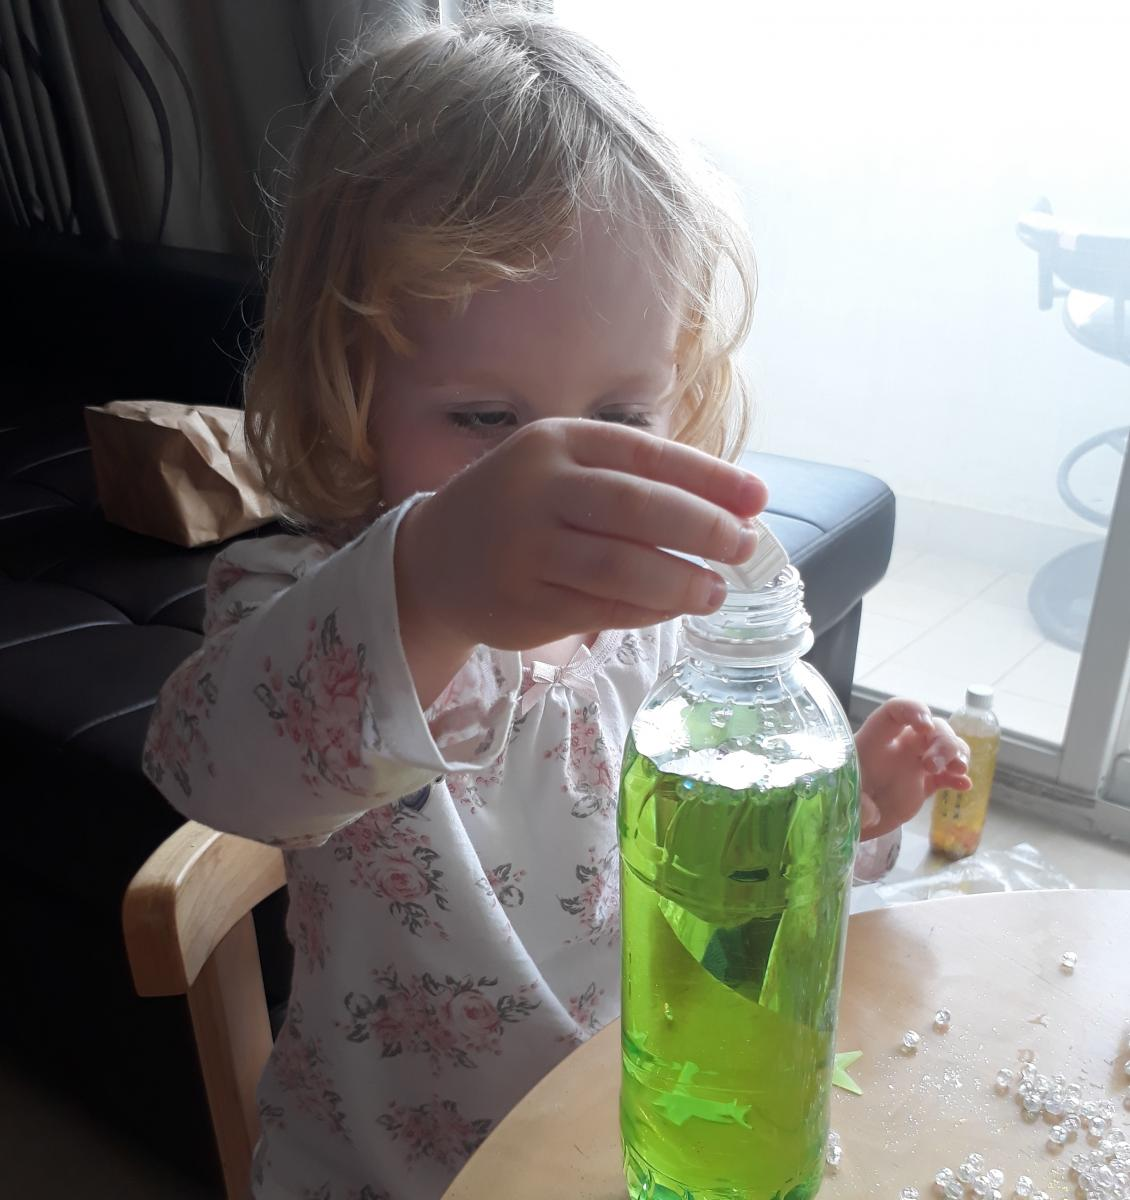 Jessica's daughter exploring a sensory activity